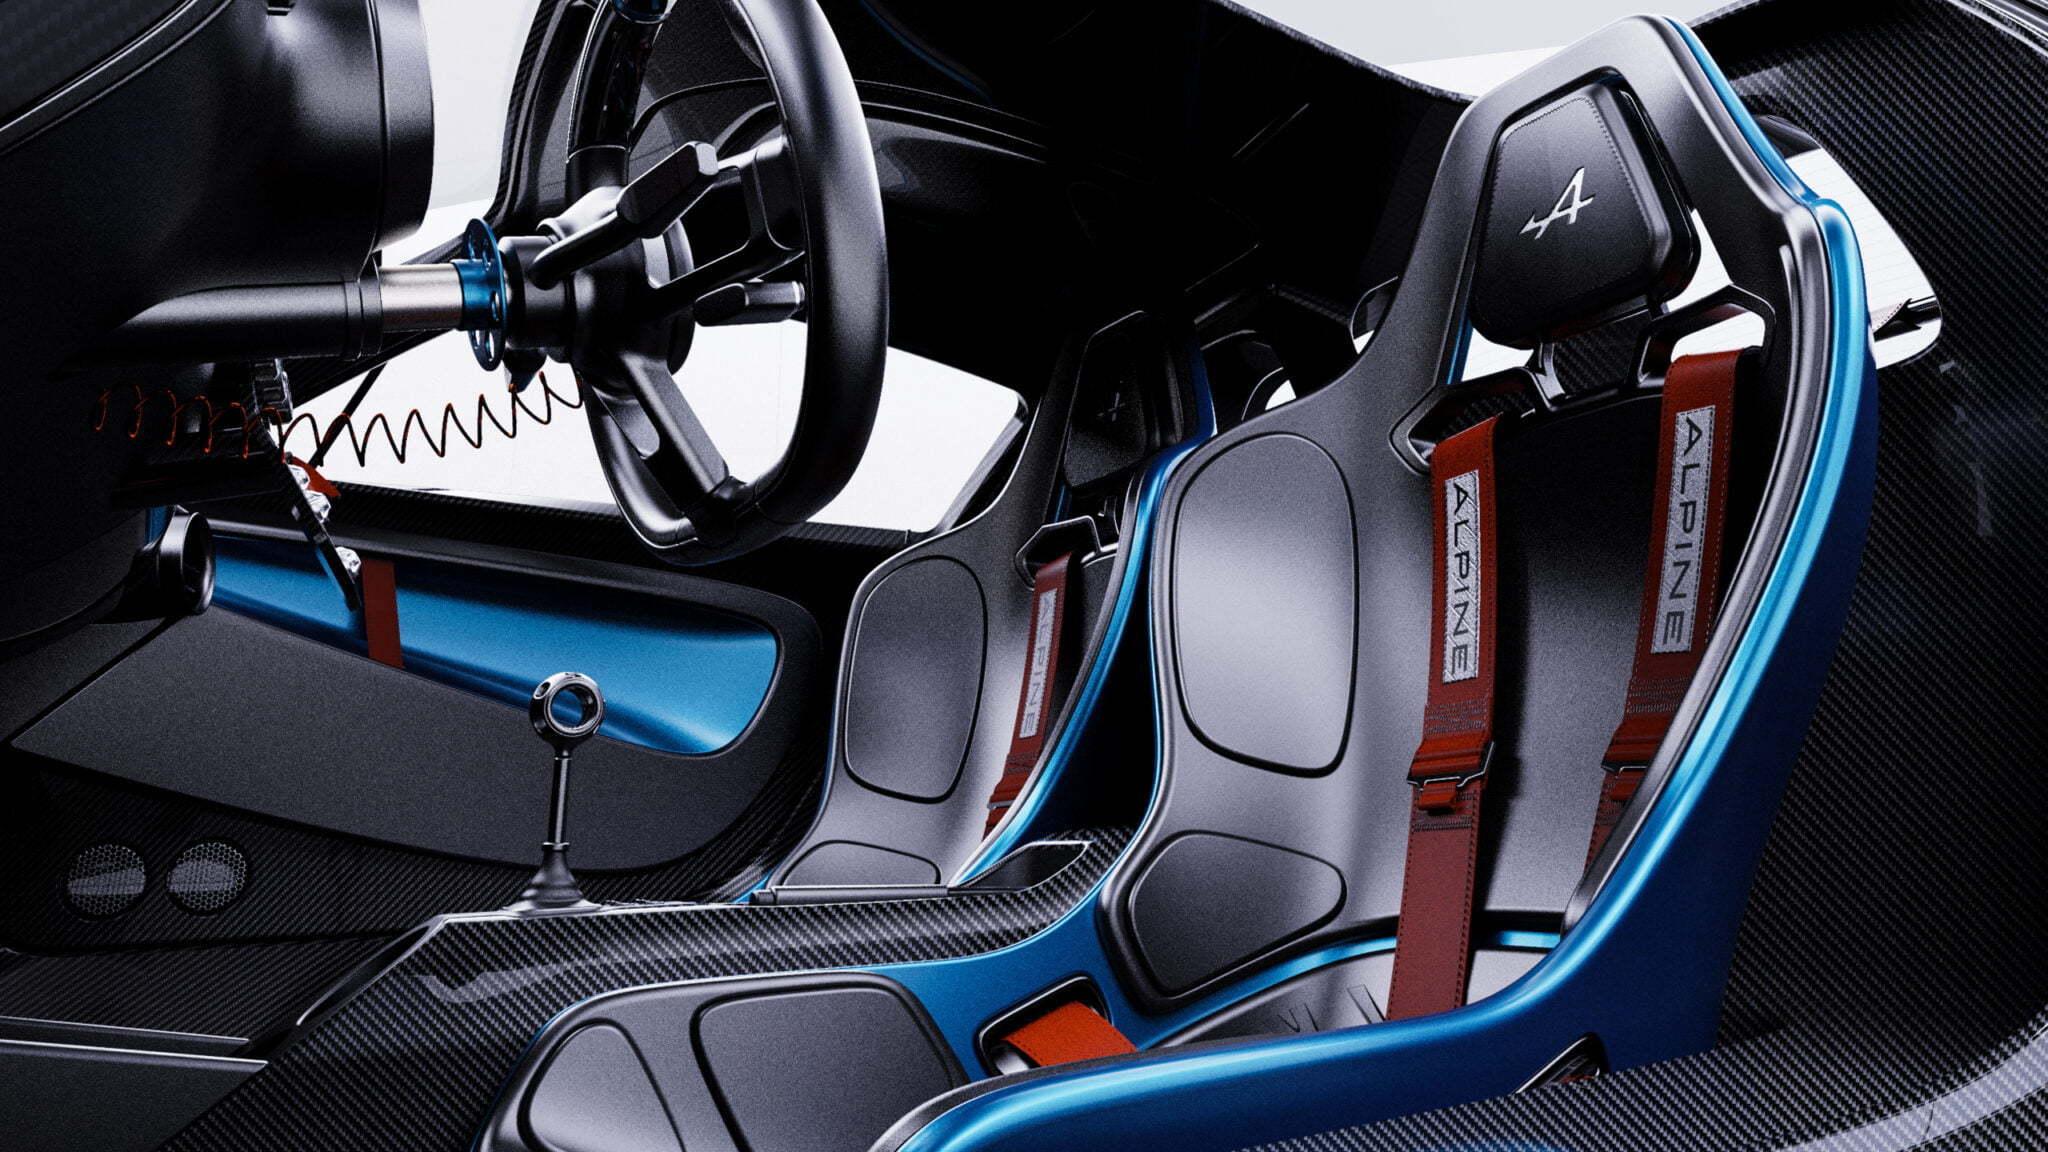 Alpine GTA Arseny Kostromin Interieur 5 | Alpine GTA : l'étude du designer Arseny Kostromin qui s'inpire de l'A110